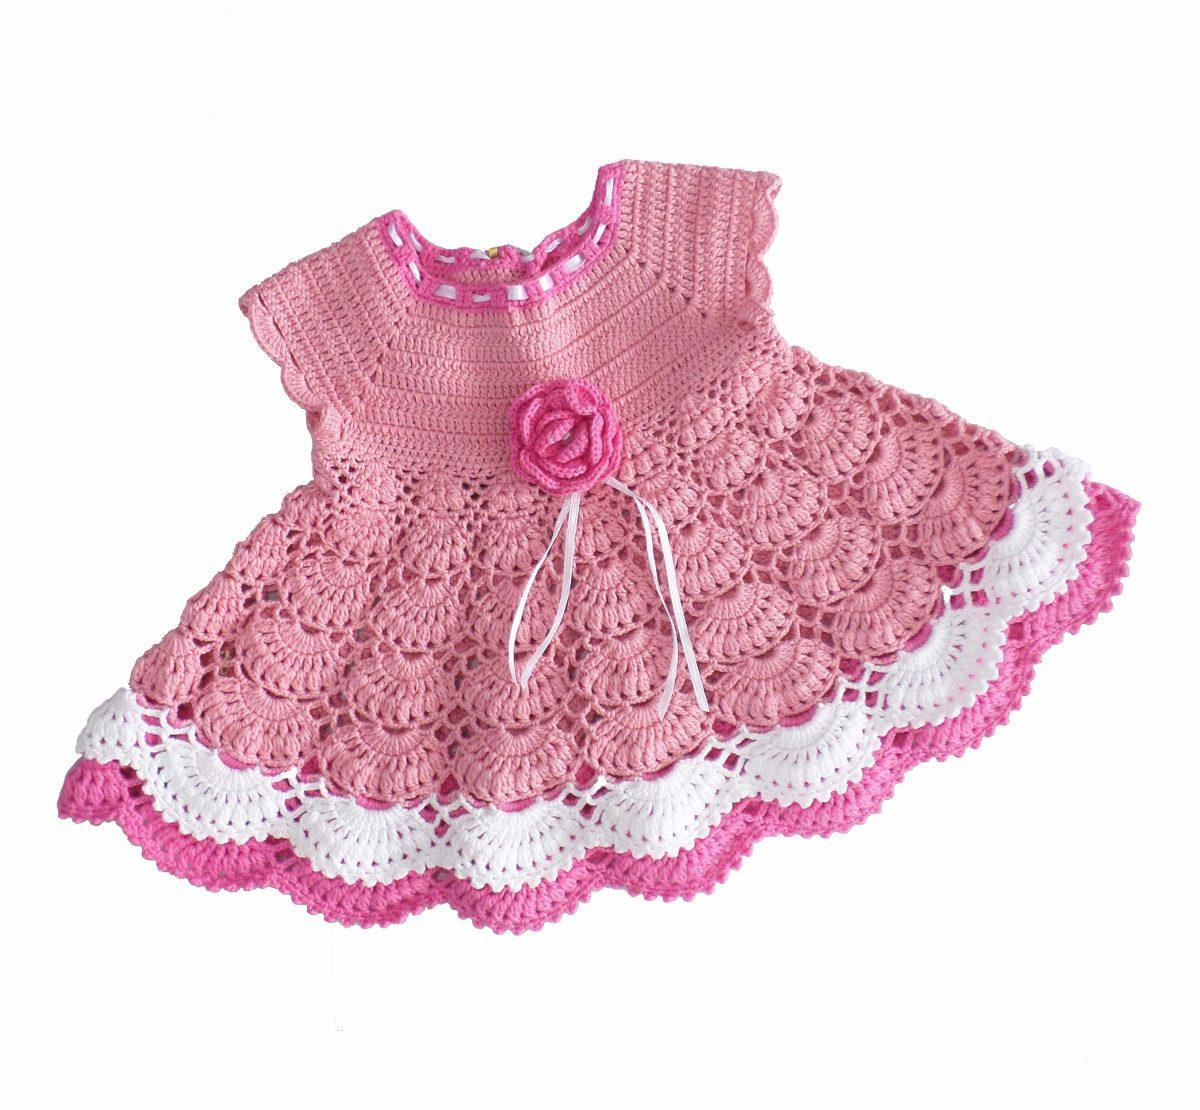 Bolsa De Festa Para Vestido Rosa : Vestido mariah de croch? infantil festa marrom e rosa r